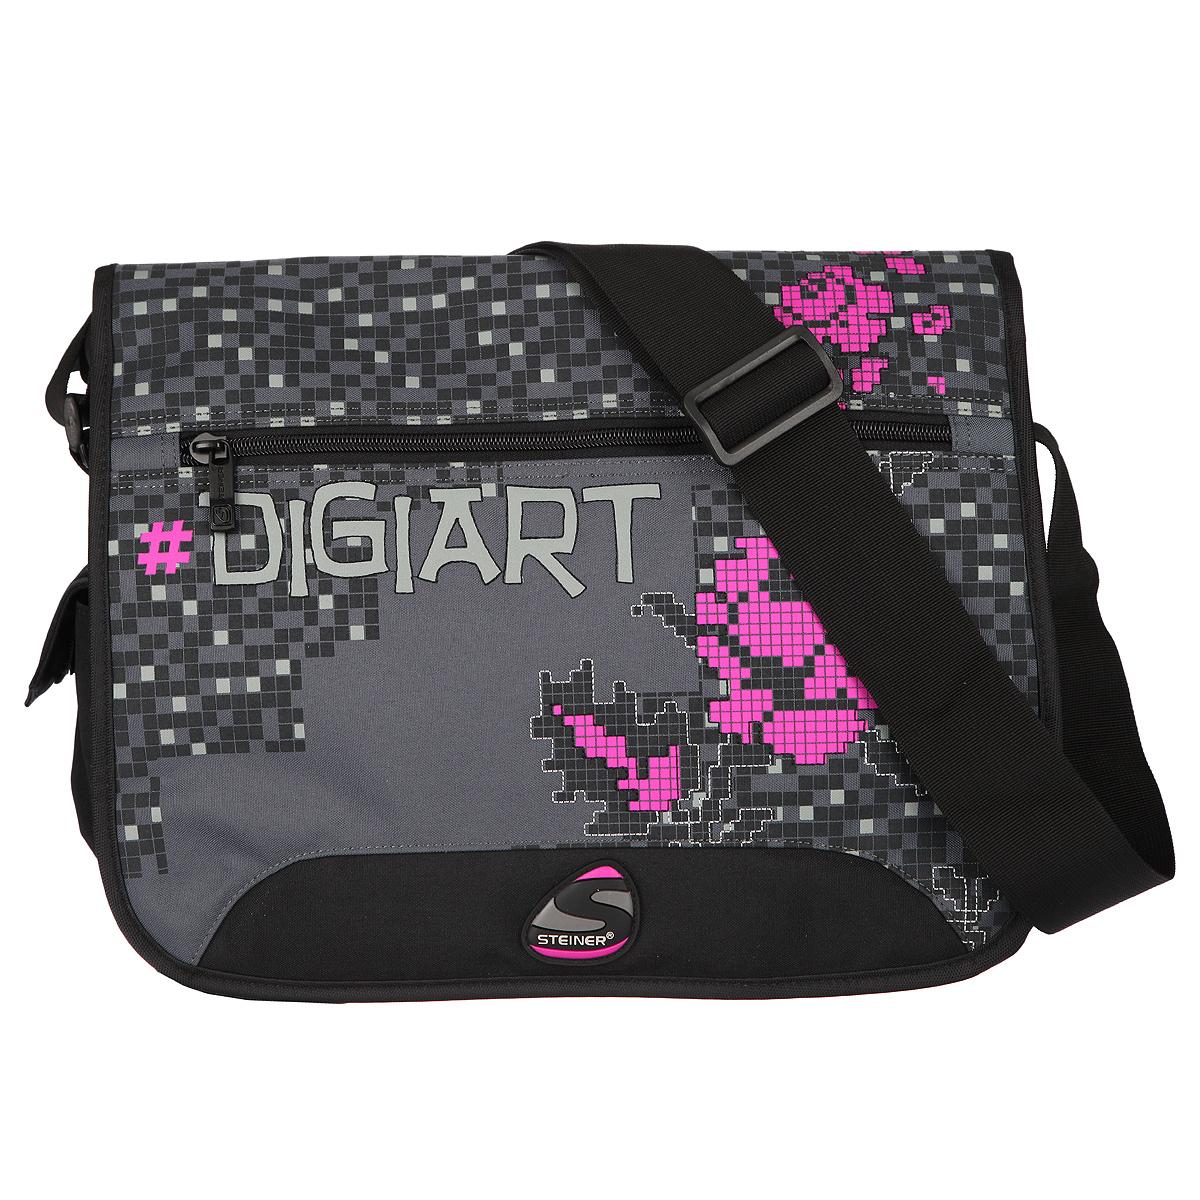 Сумка школьная Steiner Digiart, черный, серый, малиновый. 43135-505